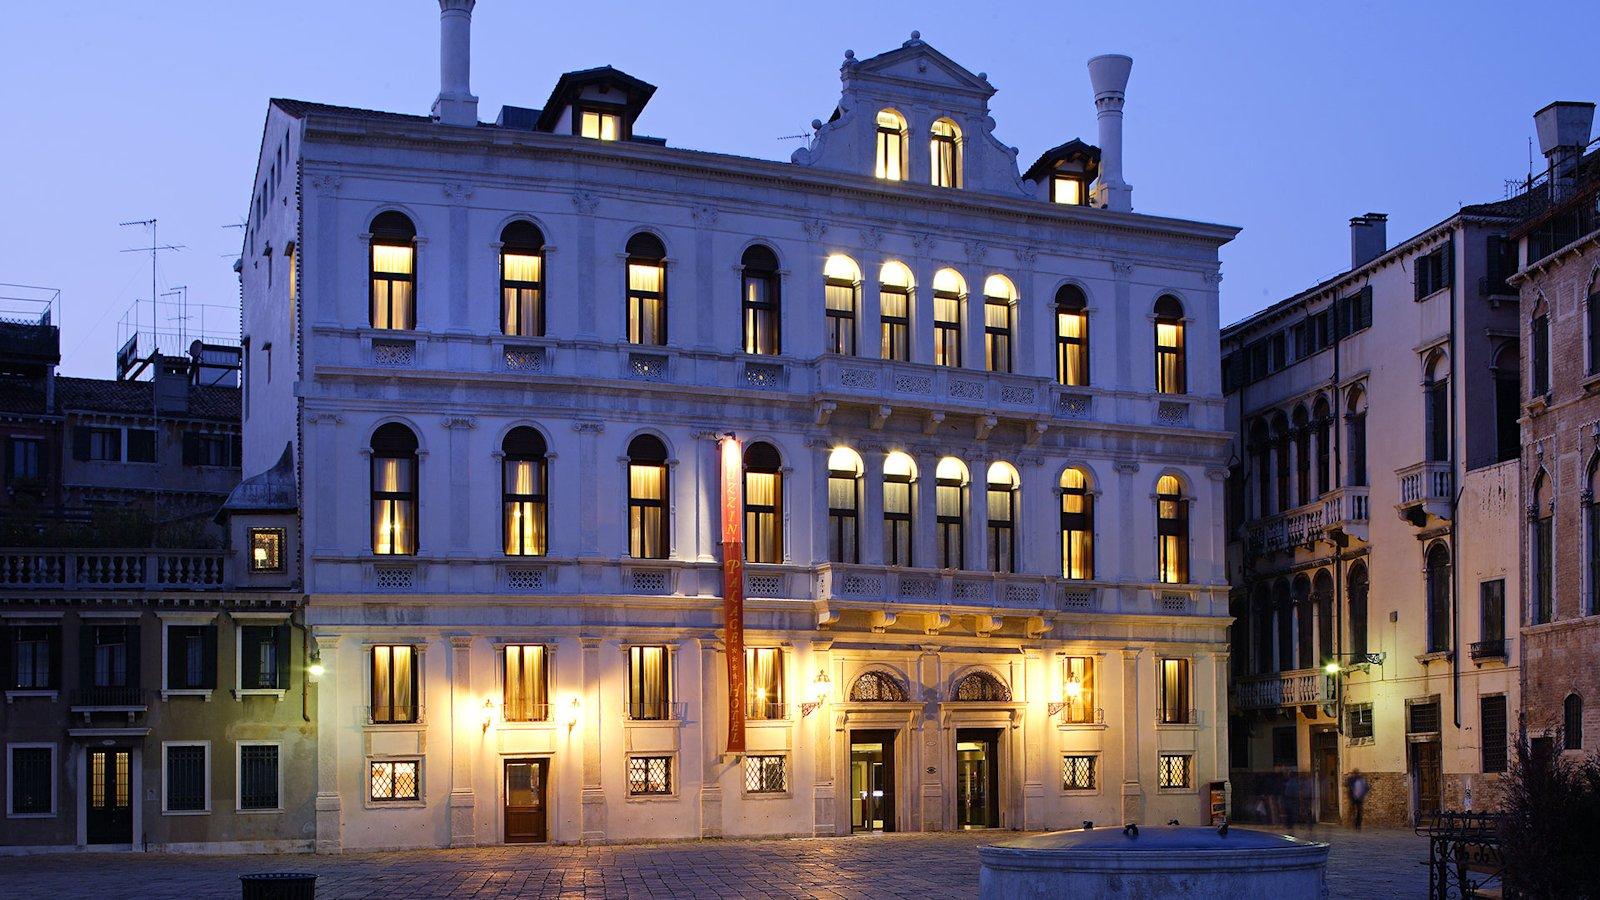 hotel ruzzini palace, Venise Italie